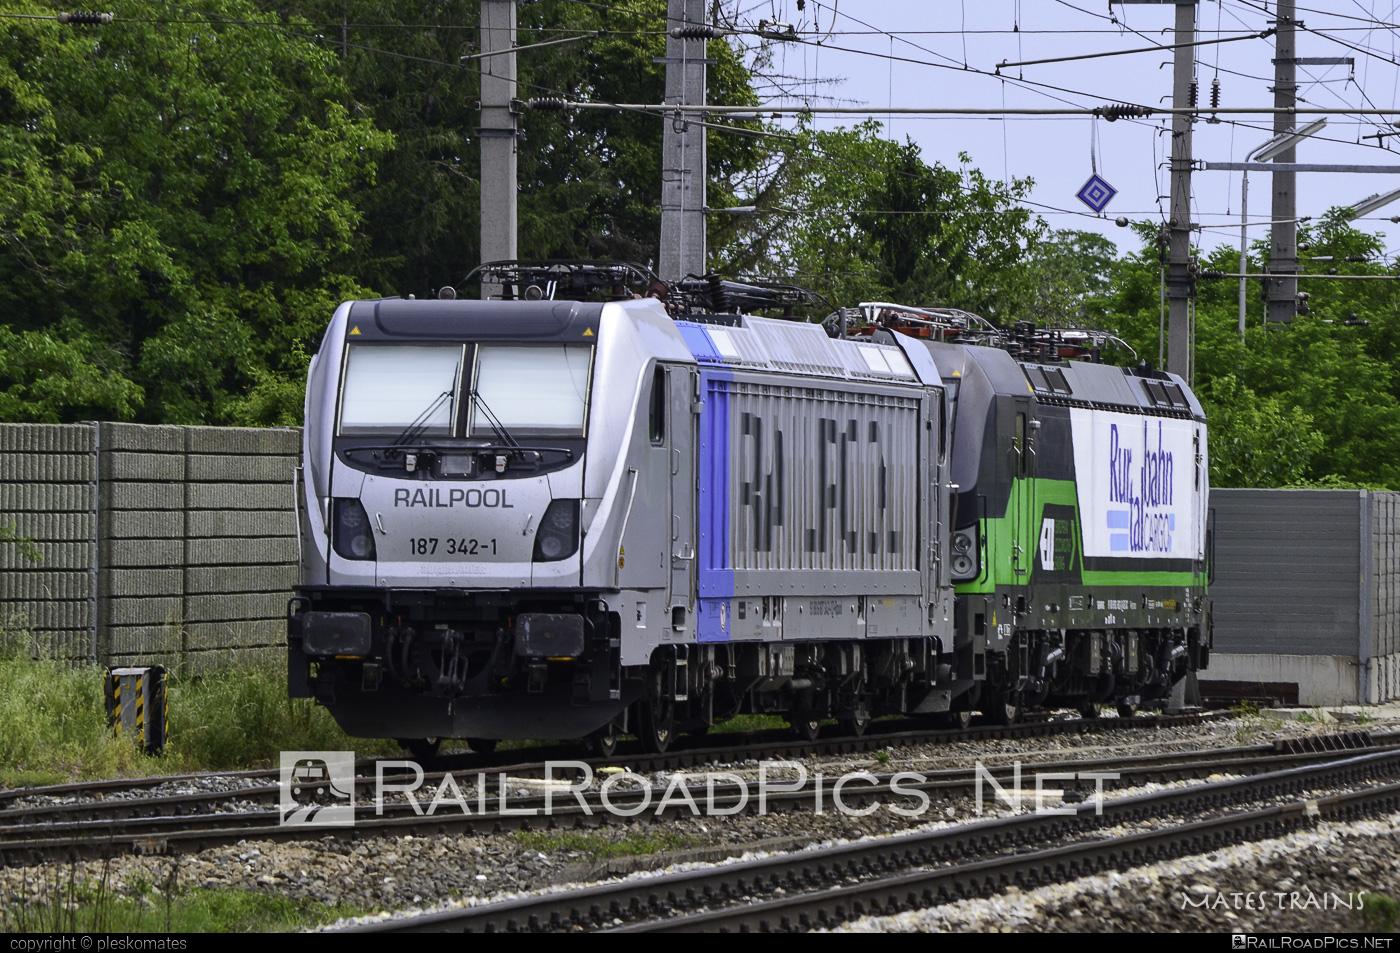 Bombardier TRAXX F160 AC3 - 187 342-1 operated by ecco-rail GmbH #bombardier #bombardiertraxx #eccorail #eccorailgmbh #railpool #railpoolgmbh #traxx #traxxf160 #traxxf160ac #traxxf160ac3